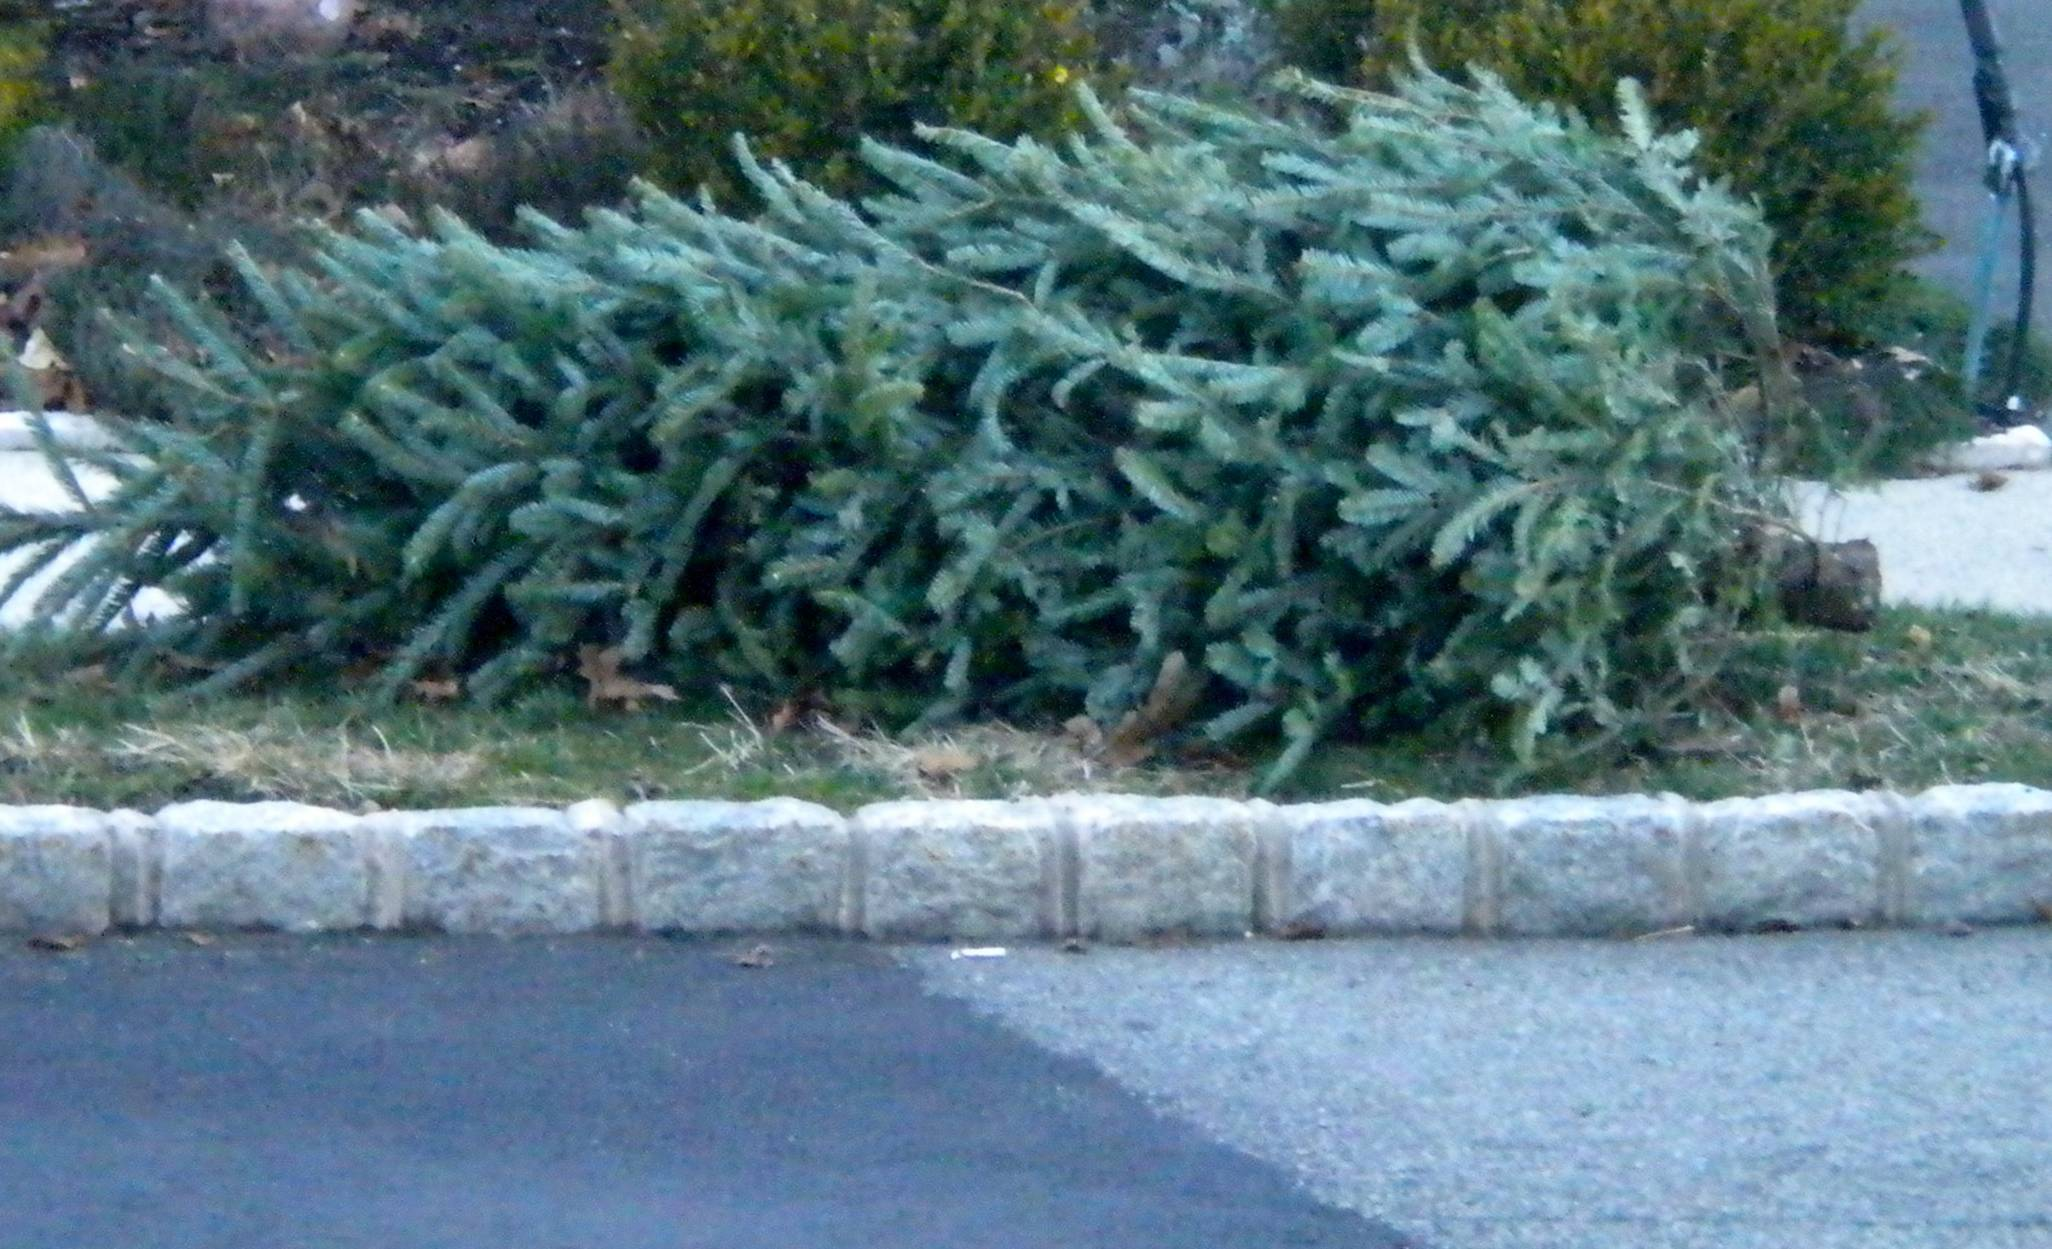 d1514b5fdc19d680e0c0_Christmas_tree_collection.JPG